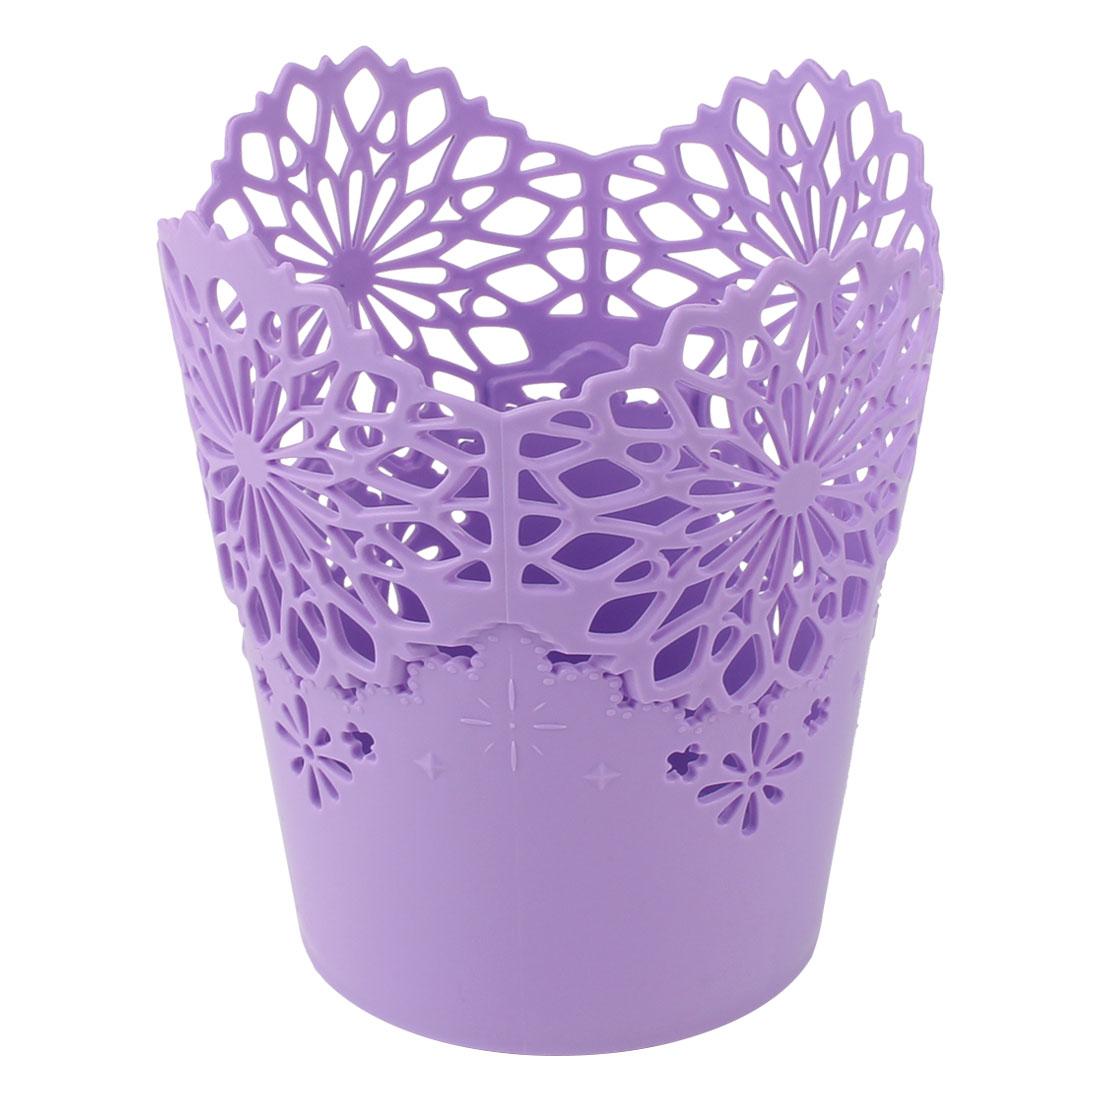 Uxcell Plastic Cylinder Home Office Wastepaper Basket Rubbish Bin